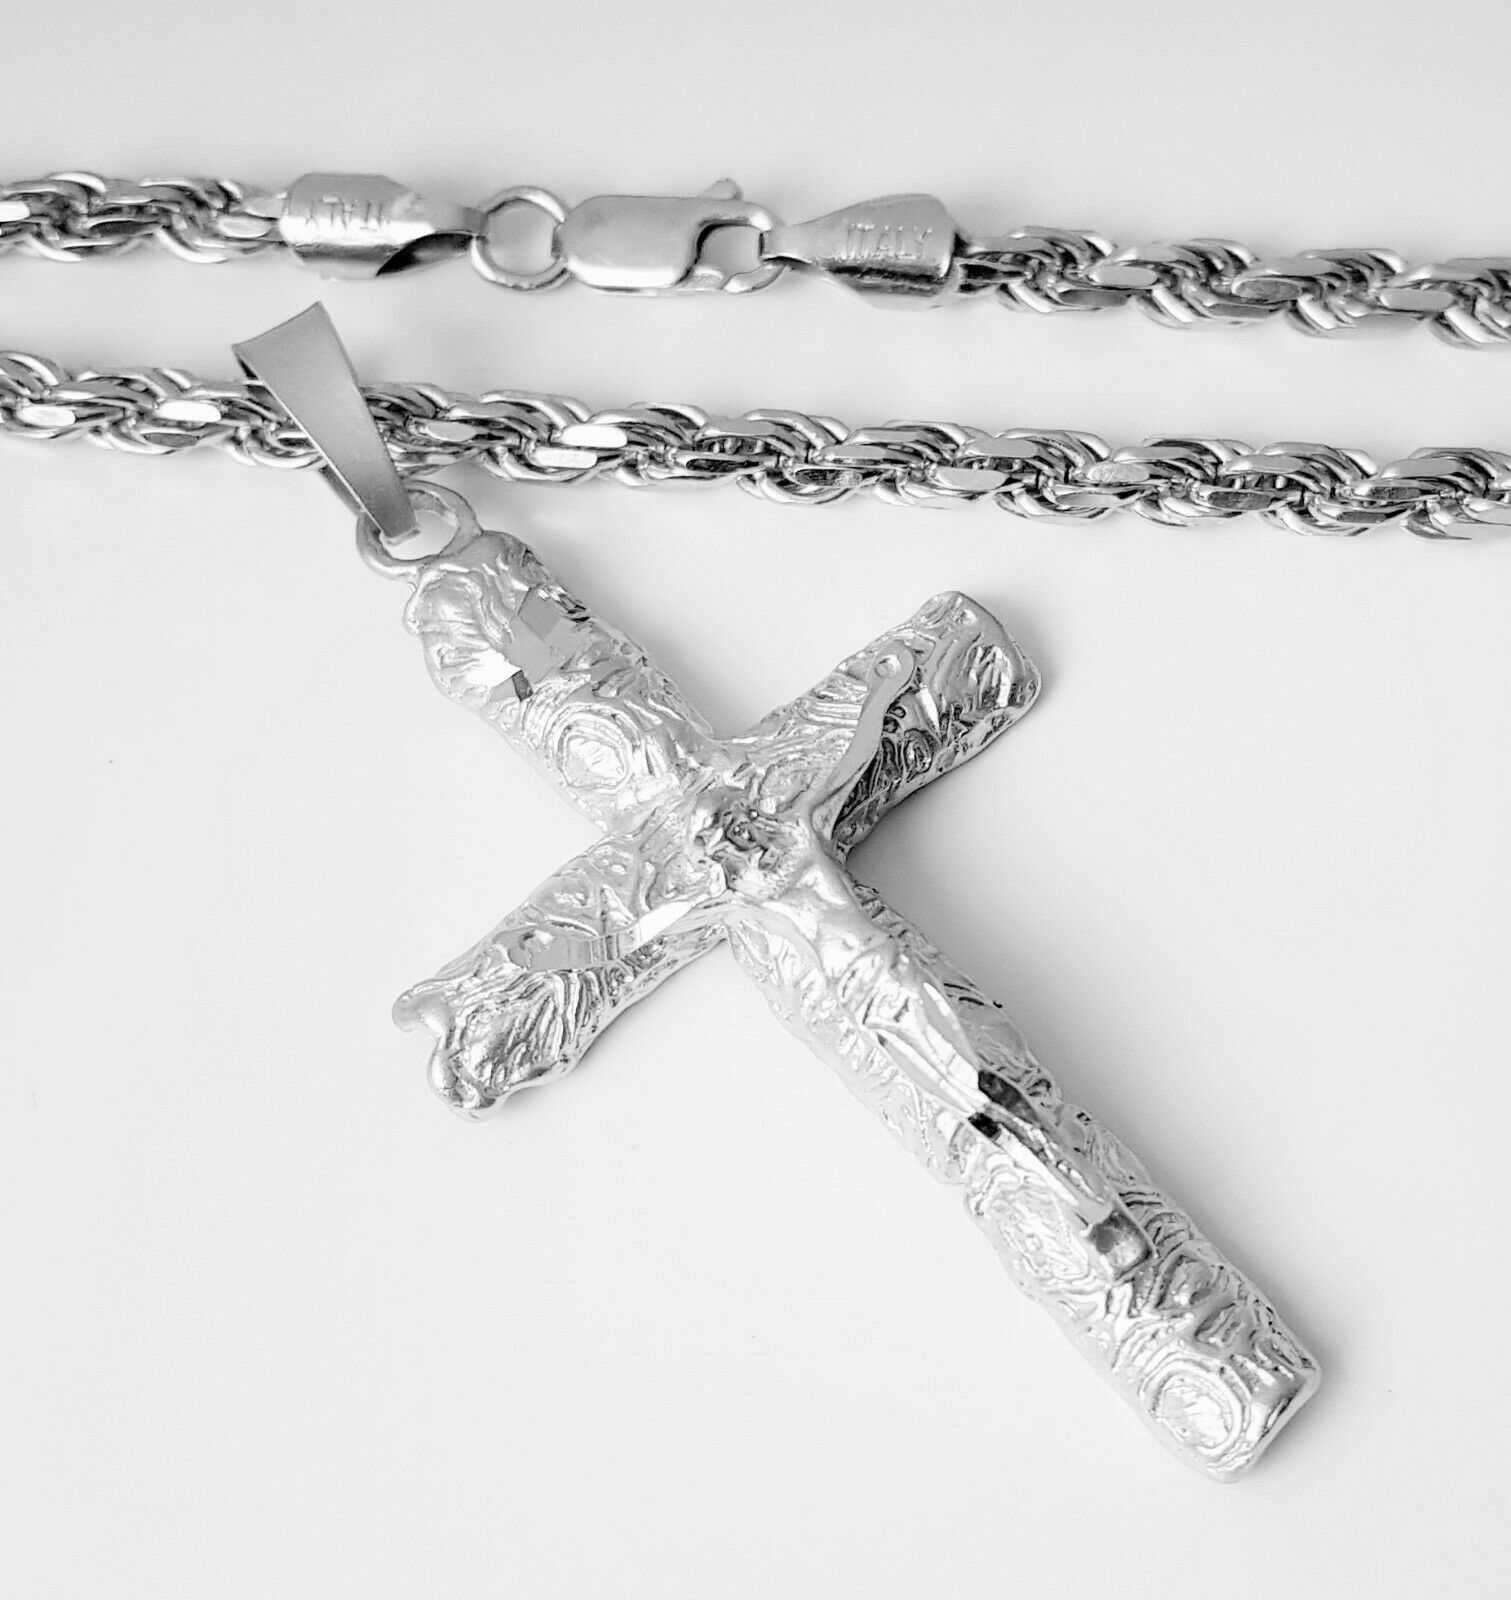 Kruzifix Jesus Christus Kreuz Anhänger 925 silber 3D diamantiert Halskette 55cm